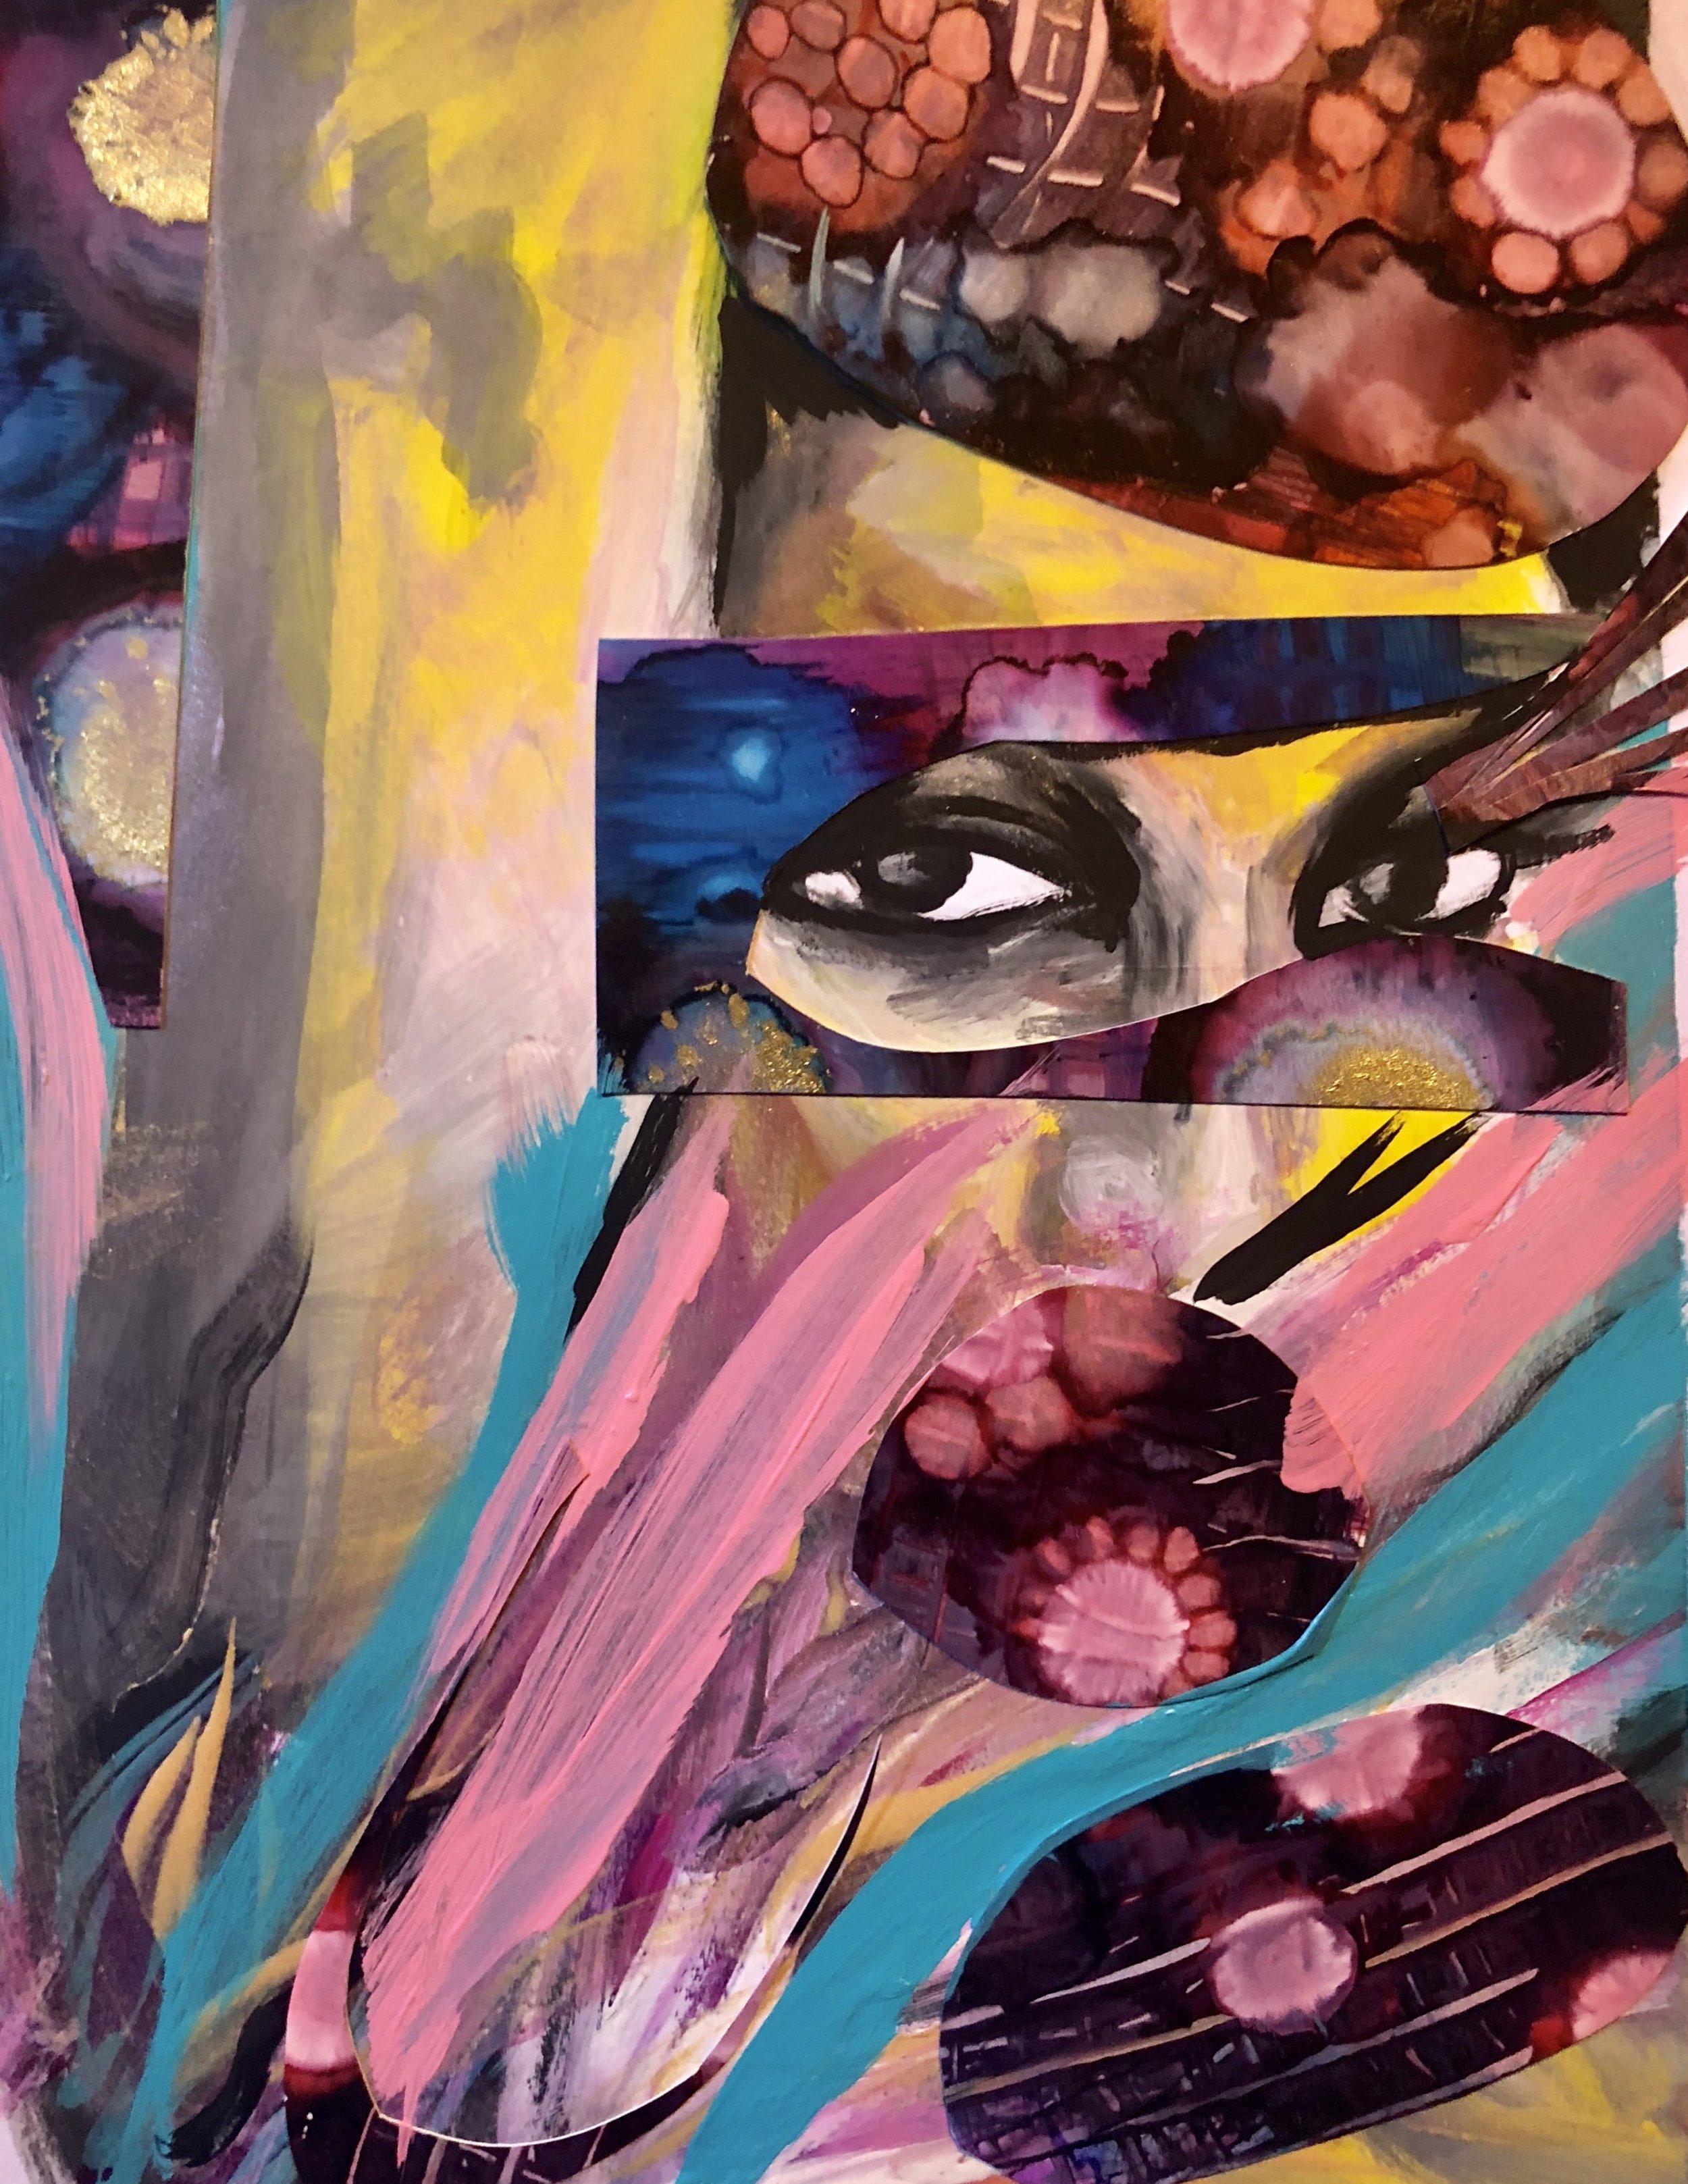 Flamingo   Acrylic mixed media on paper  9.5 x 11  200   Prints available